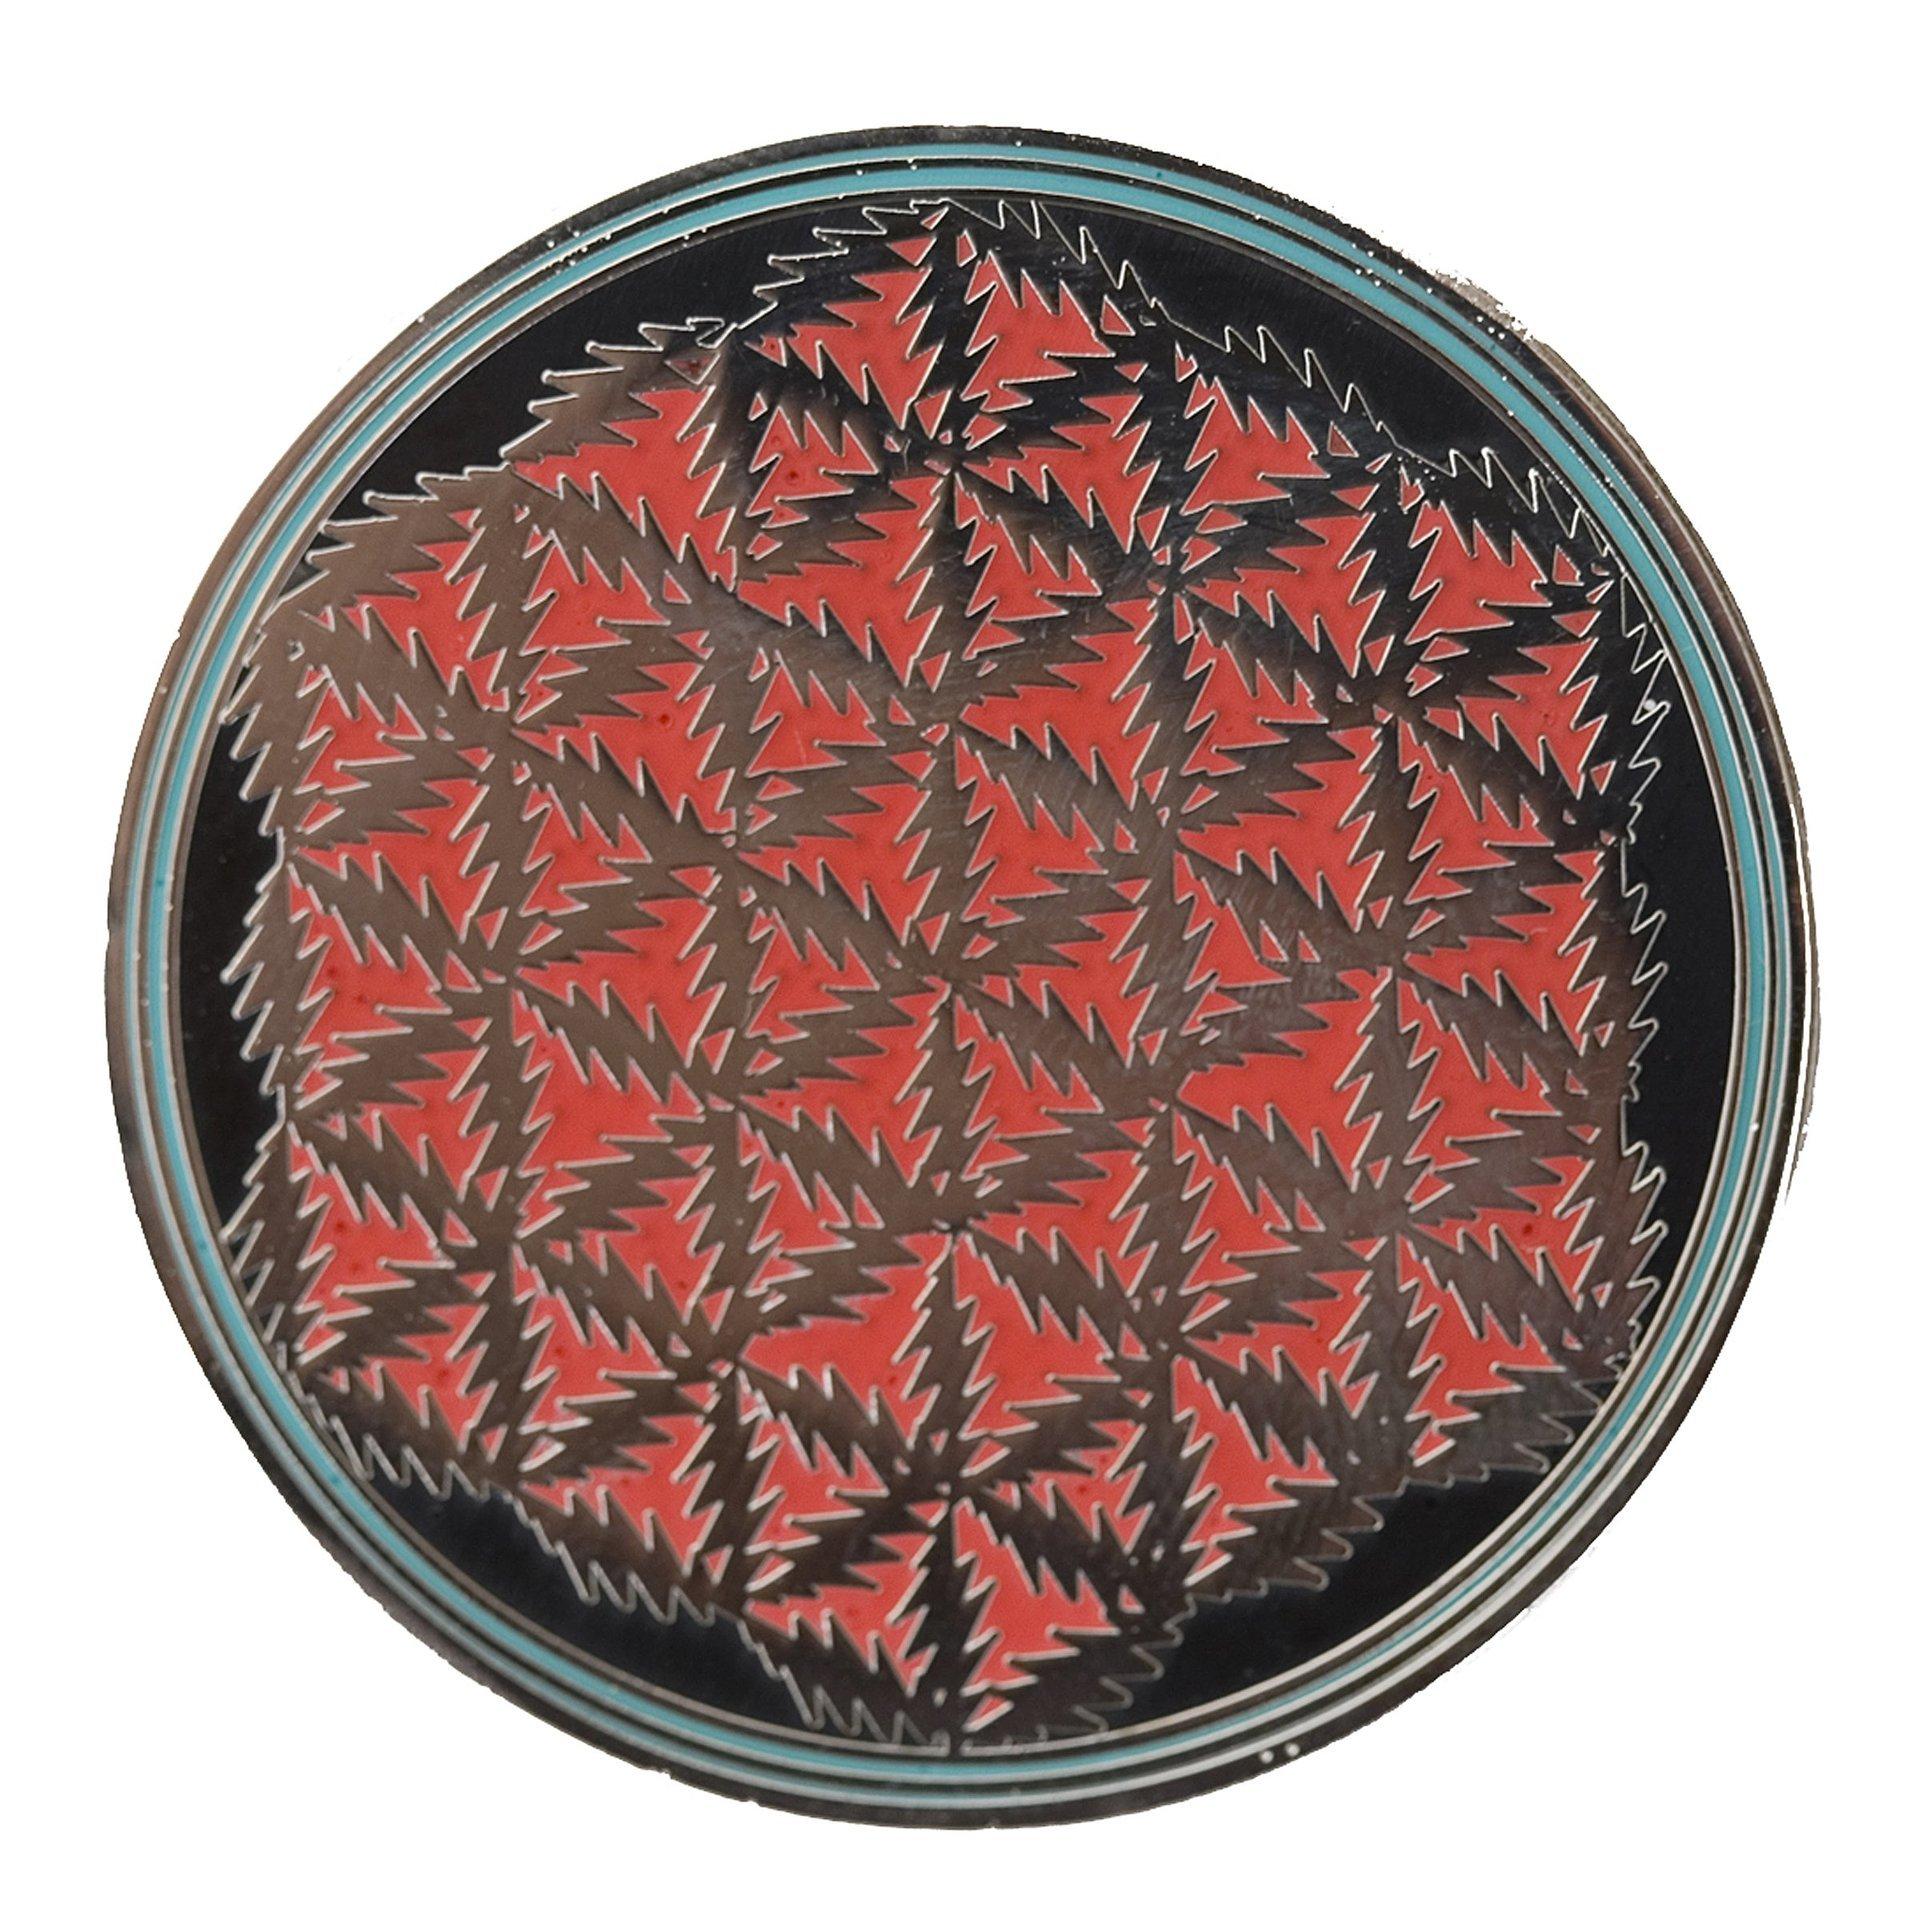 Grateful Dead - Flower of Life Lightning Bolts Black Pin